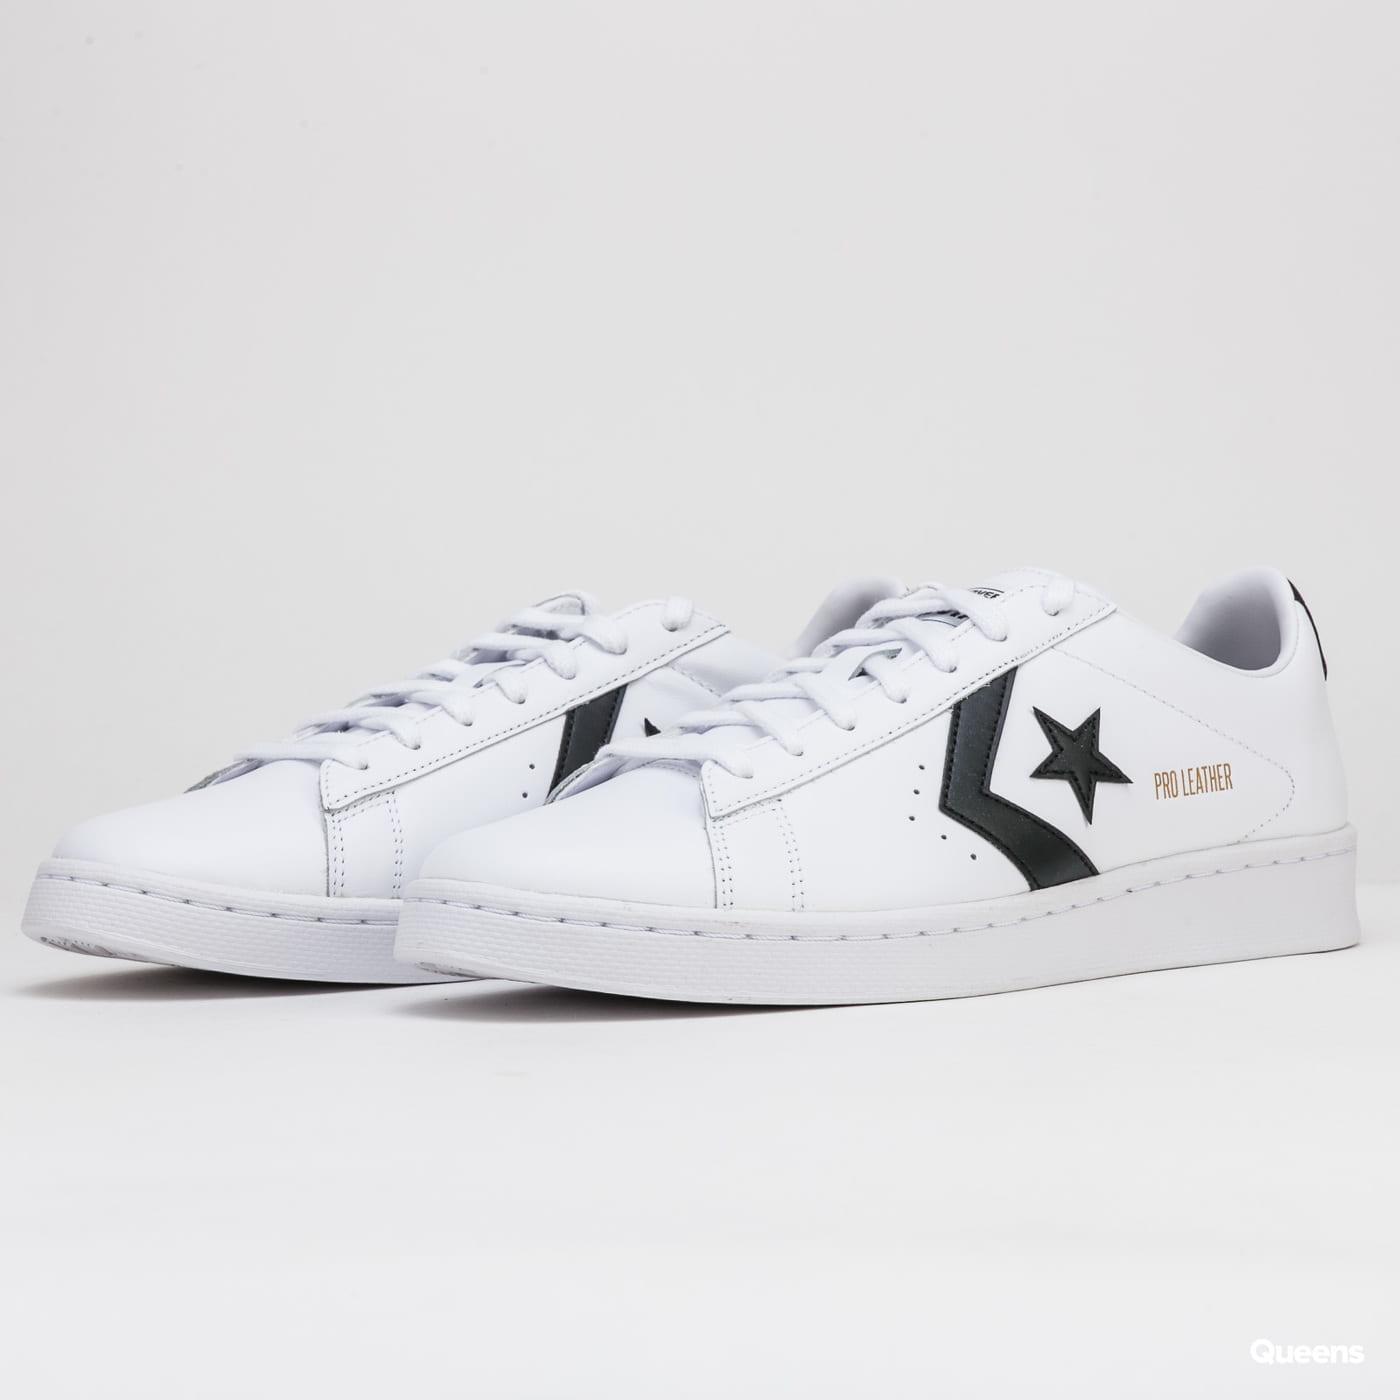 Converse Pro Leather Gold Standard OX white / cblack / white